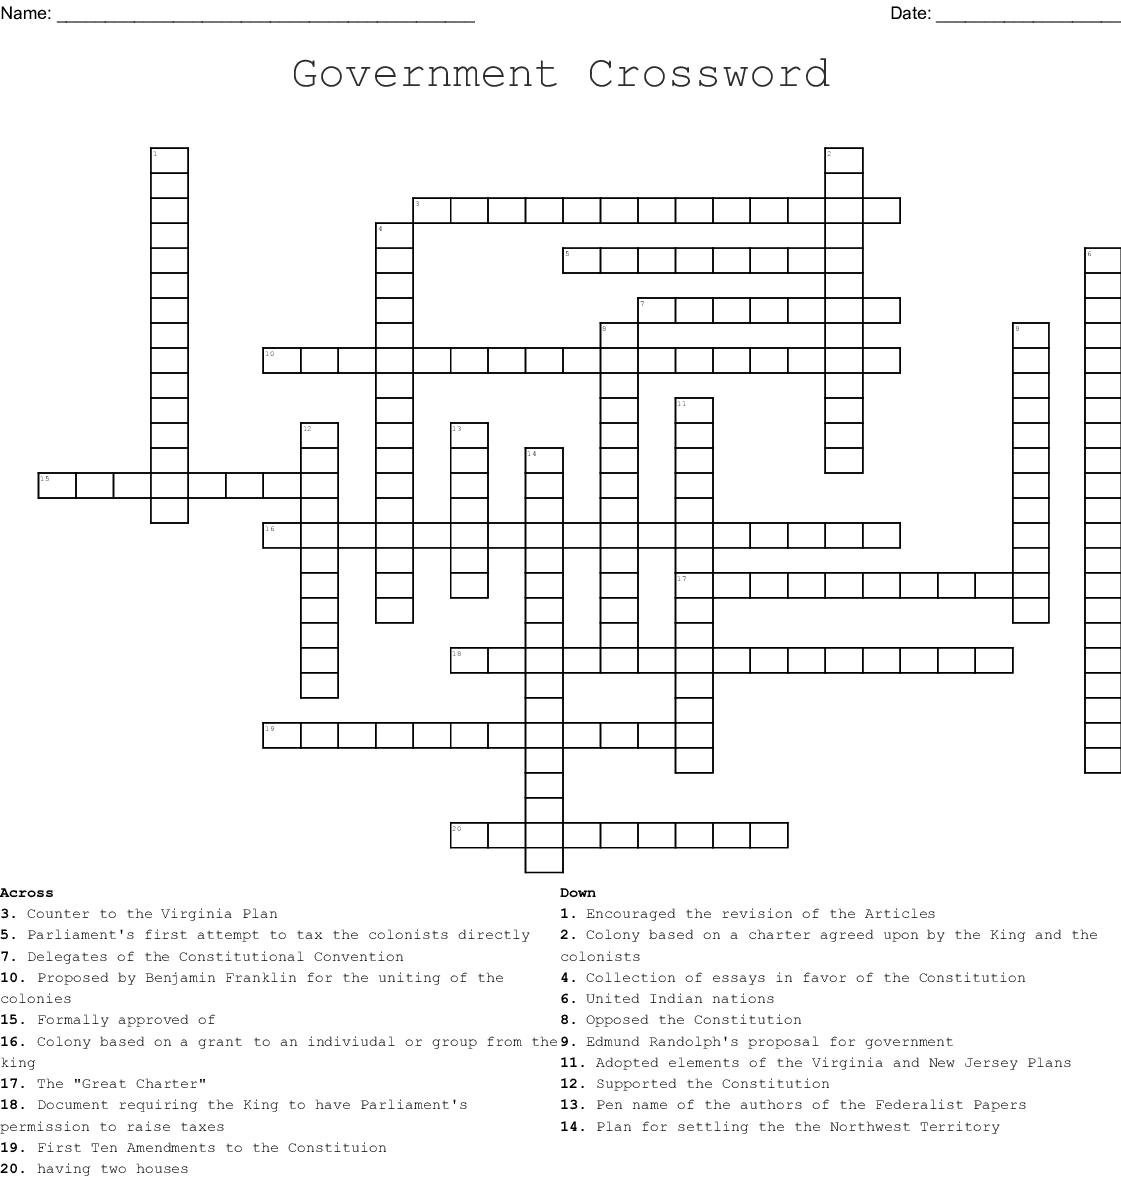 Origins Of American Government Crossword